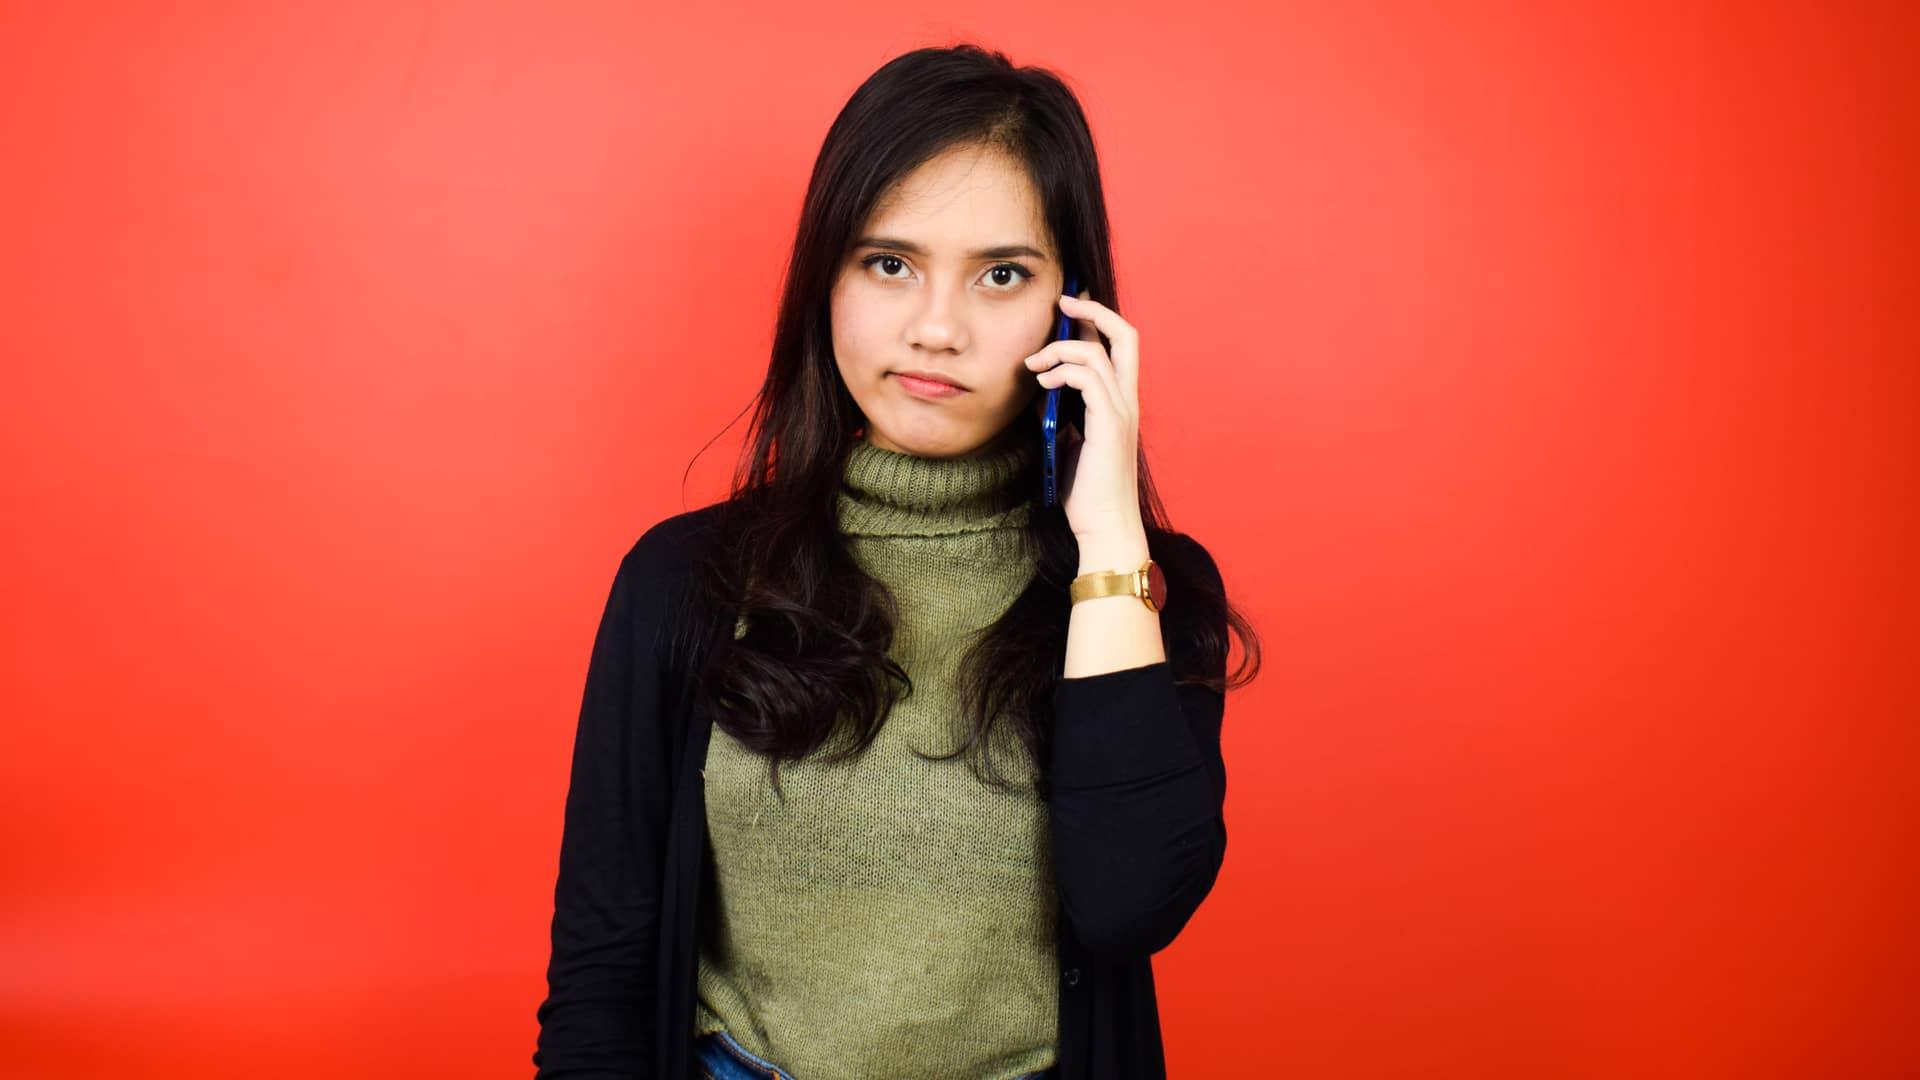 Pago de deudas en Vodafone: paso a paso